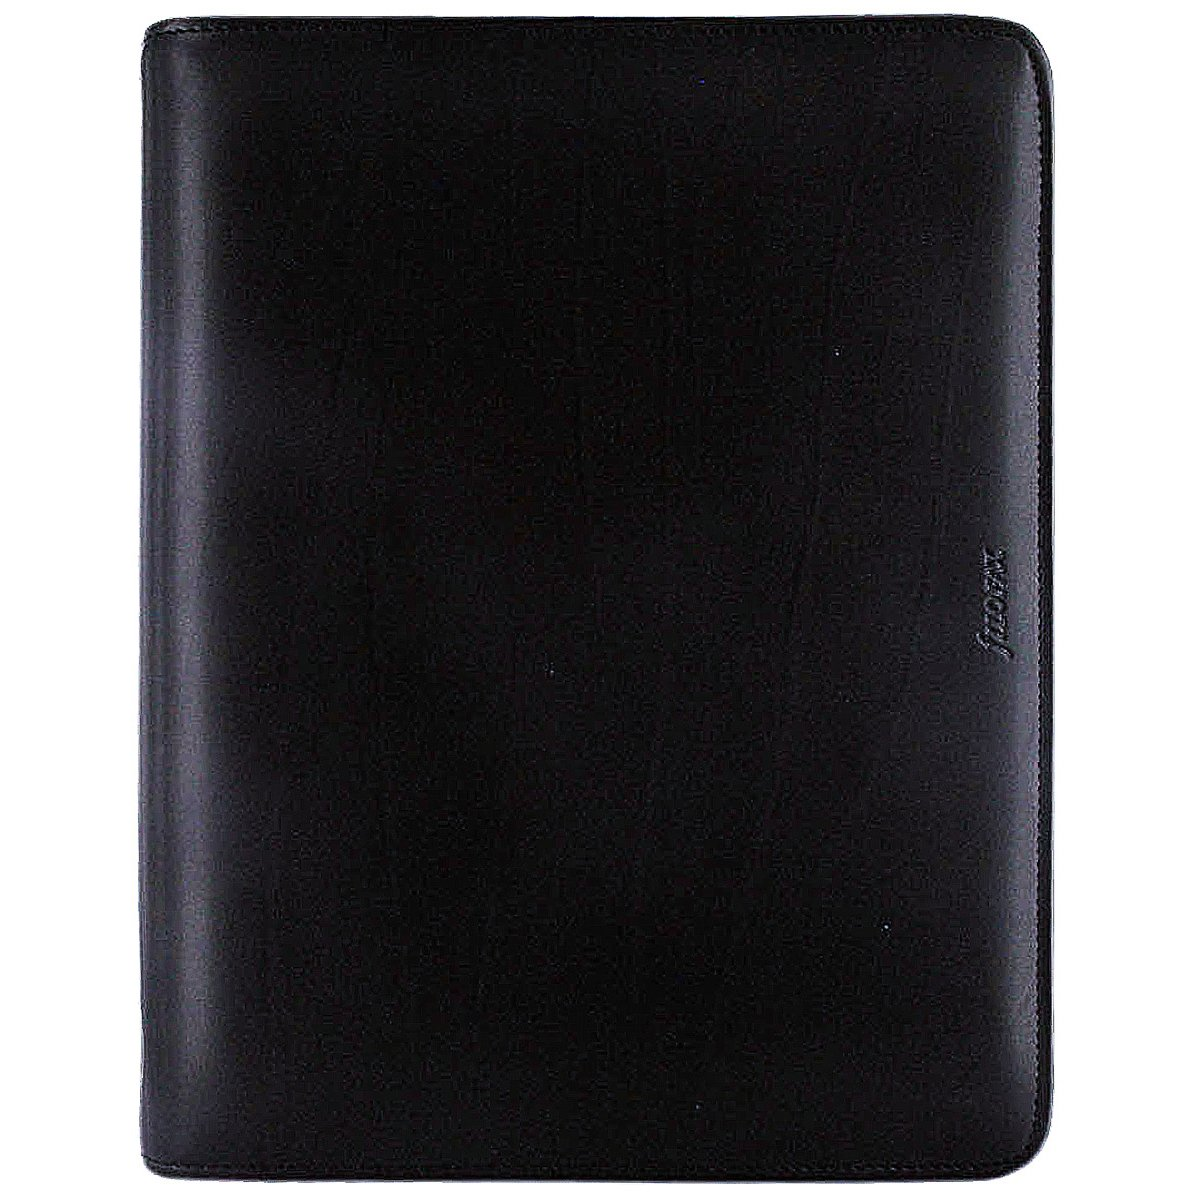 Filofax A5 Metropol Zip Navy Diary Organiser